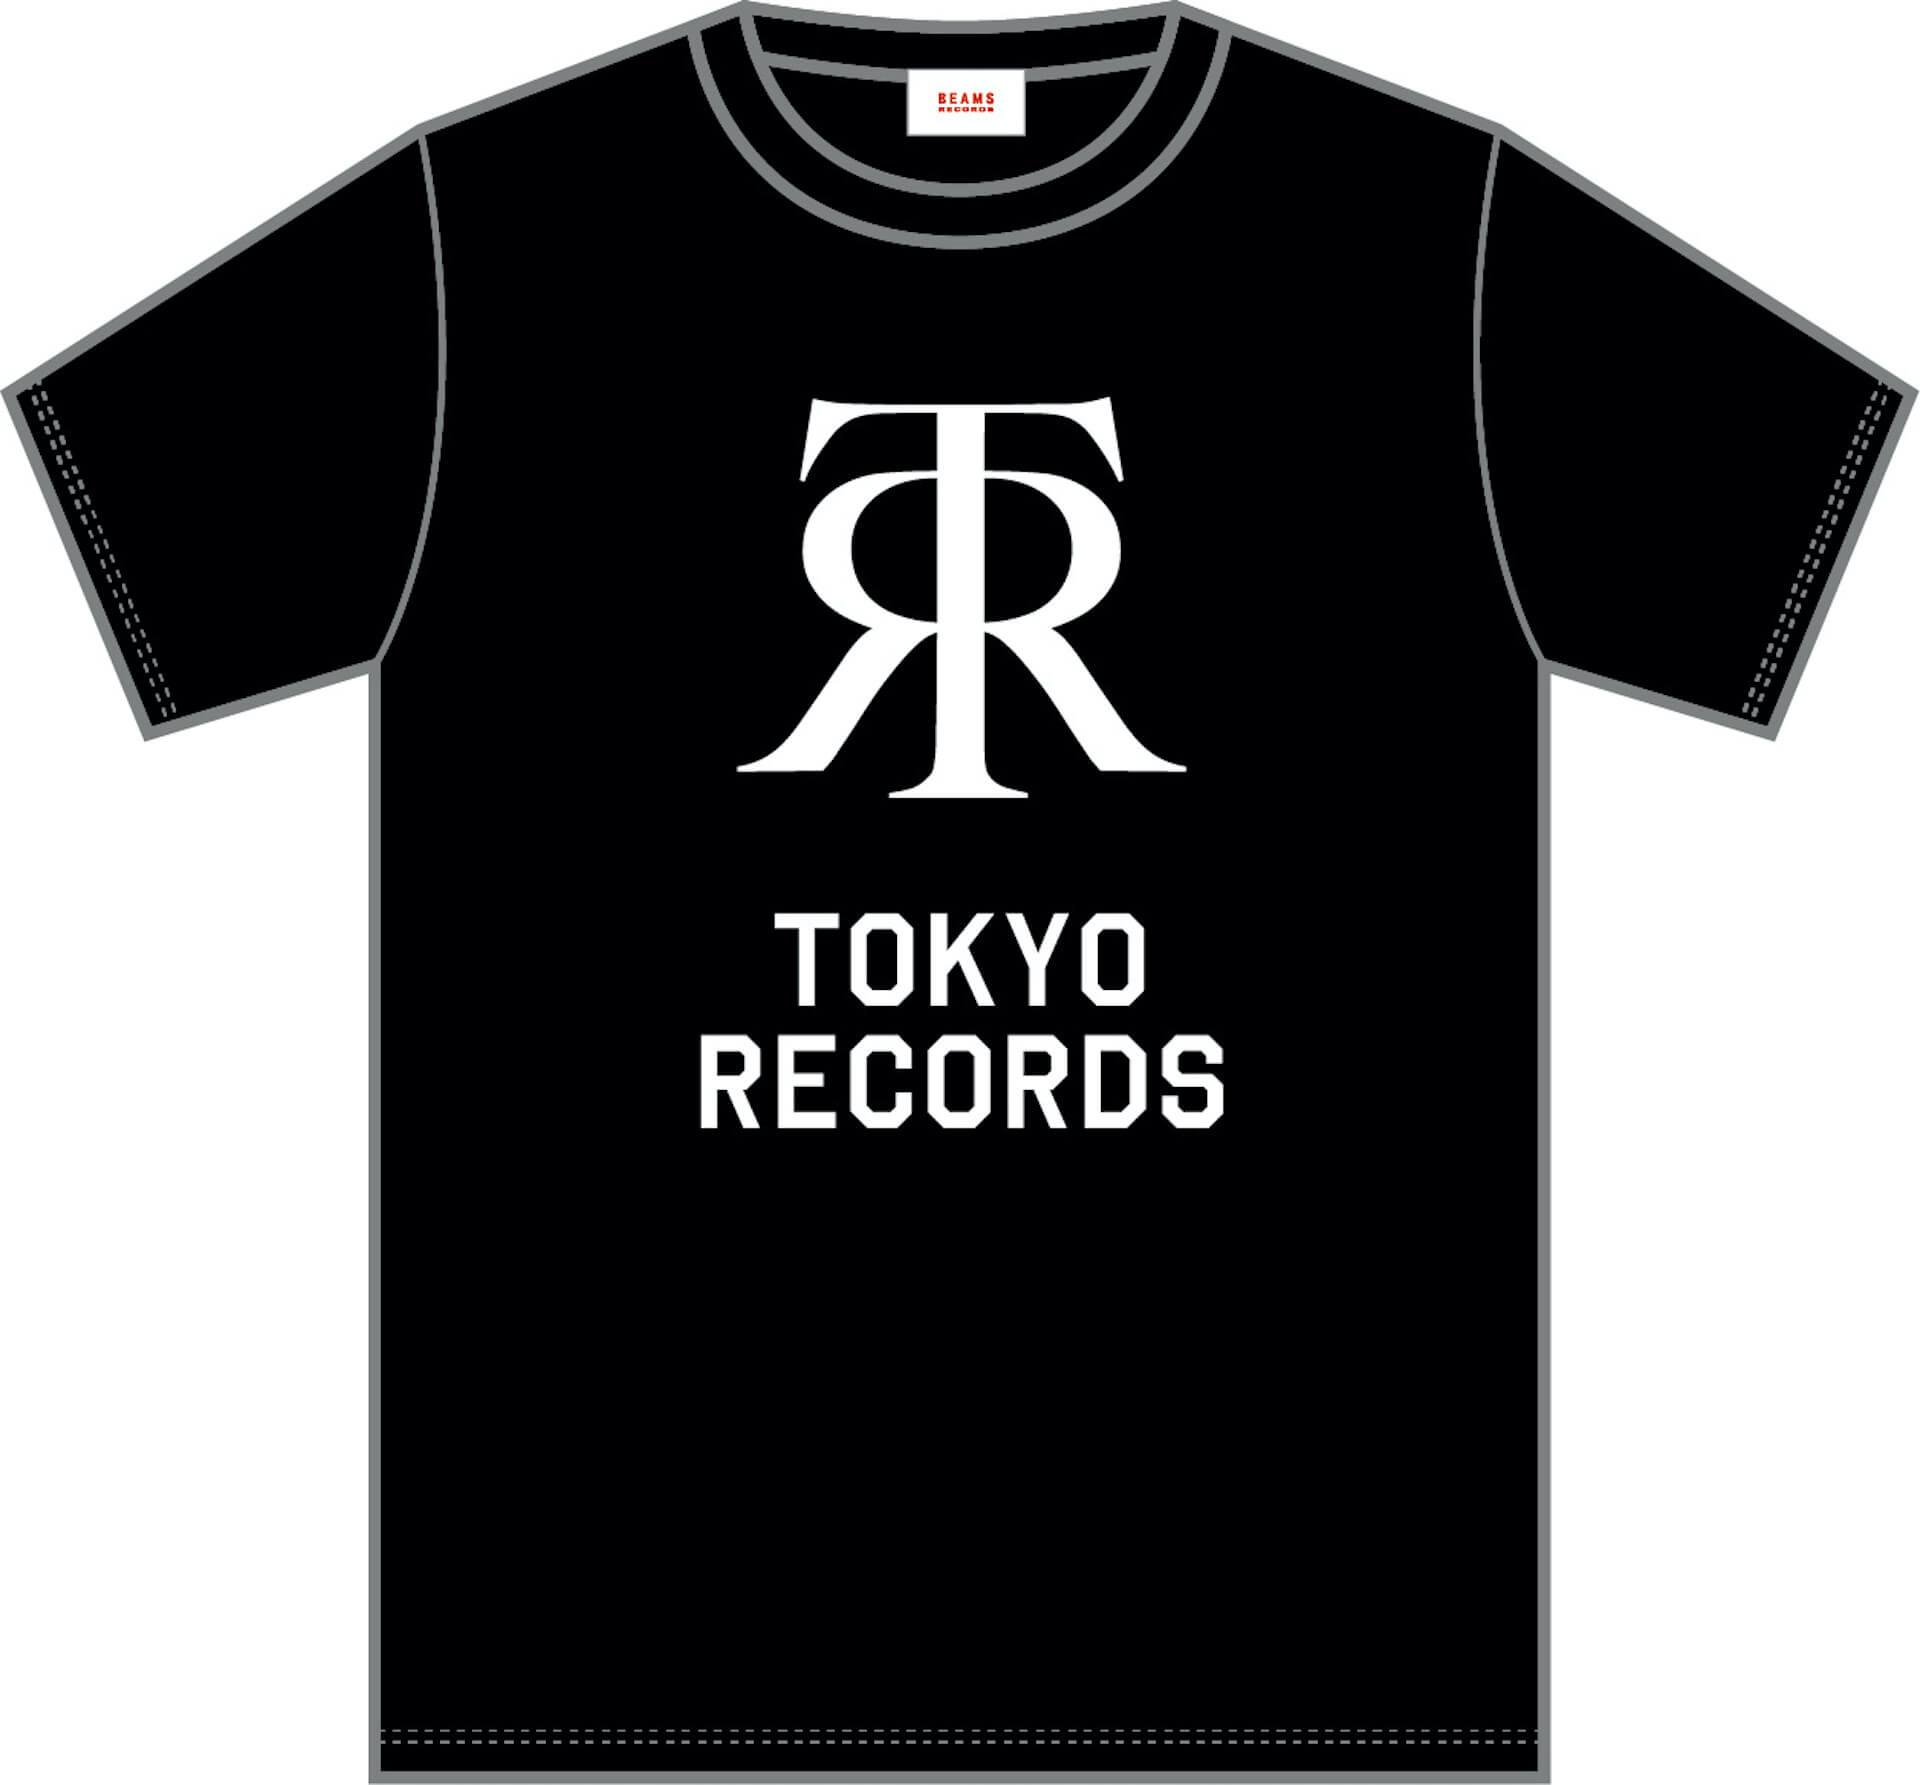 J-WAVE × BEAMS RECORDSのTシャツ第2弾が受注販売開始!本秀康、cherry chill will、TOWA TEIらが参加 music200612_jwave_beamsrecords_08